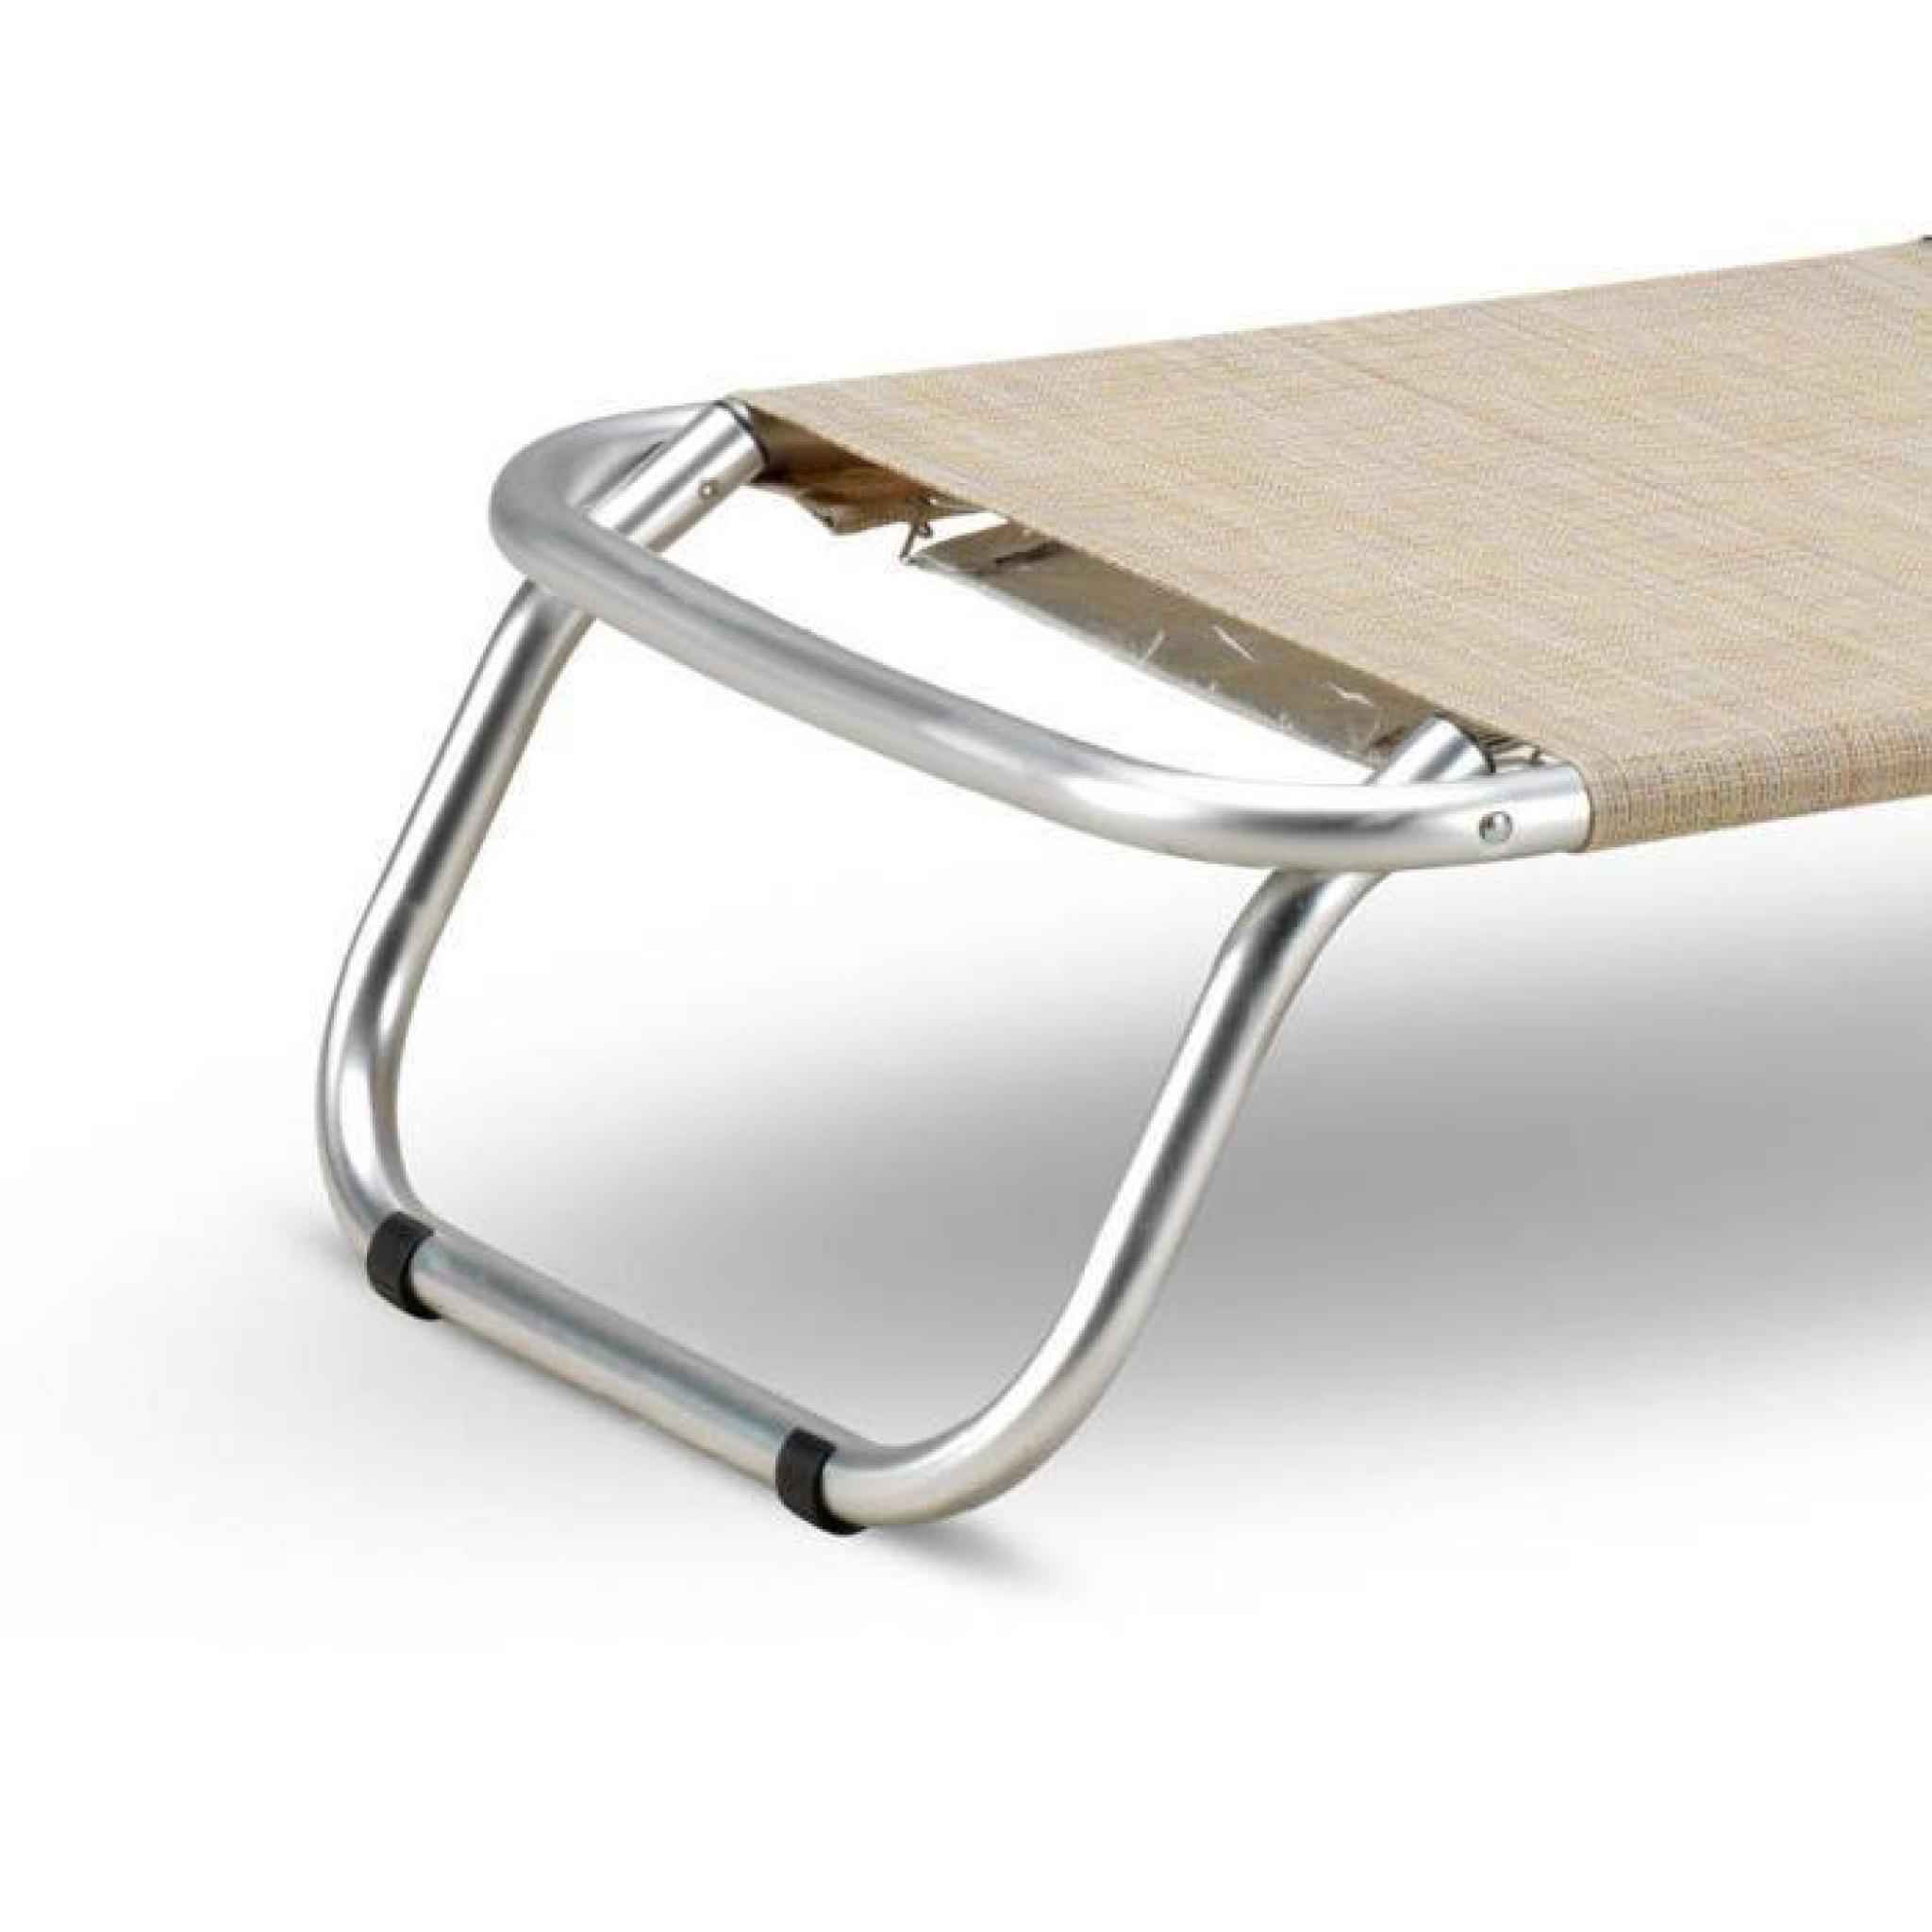 Pliante Fauteuil Transat De Plage Piscine Aluminium Gargano Chaise 92DEHI